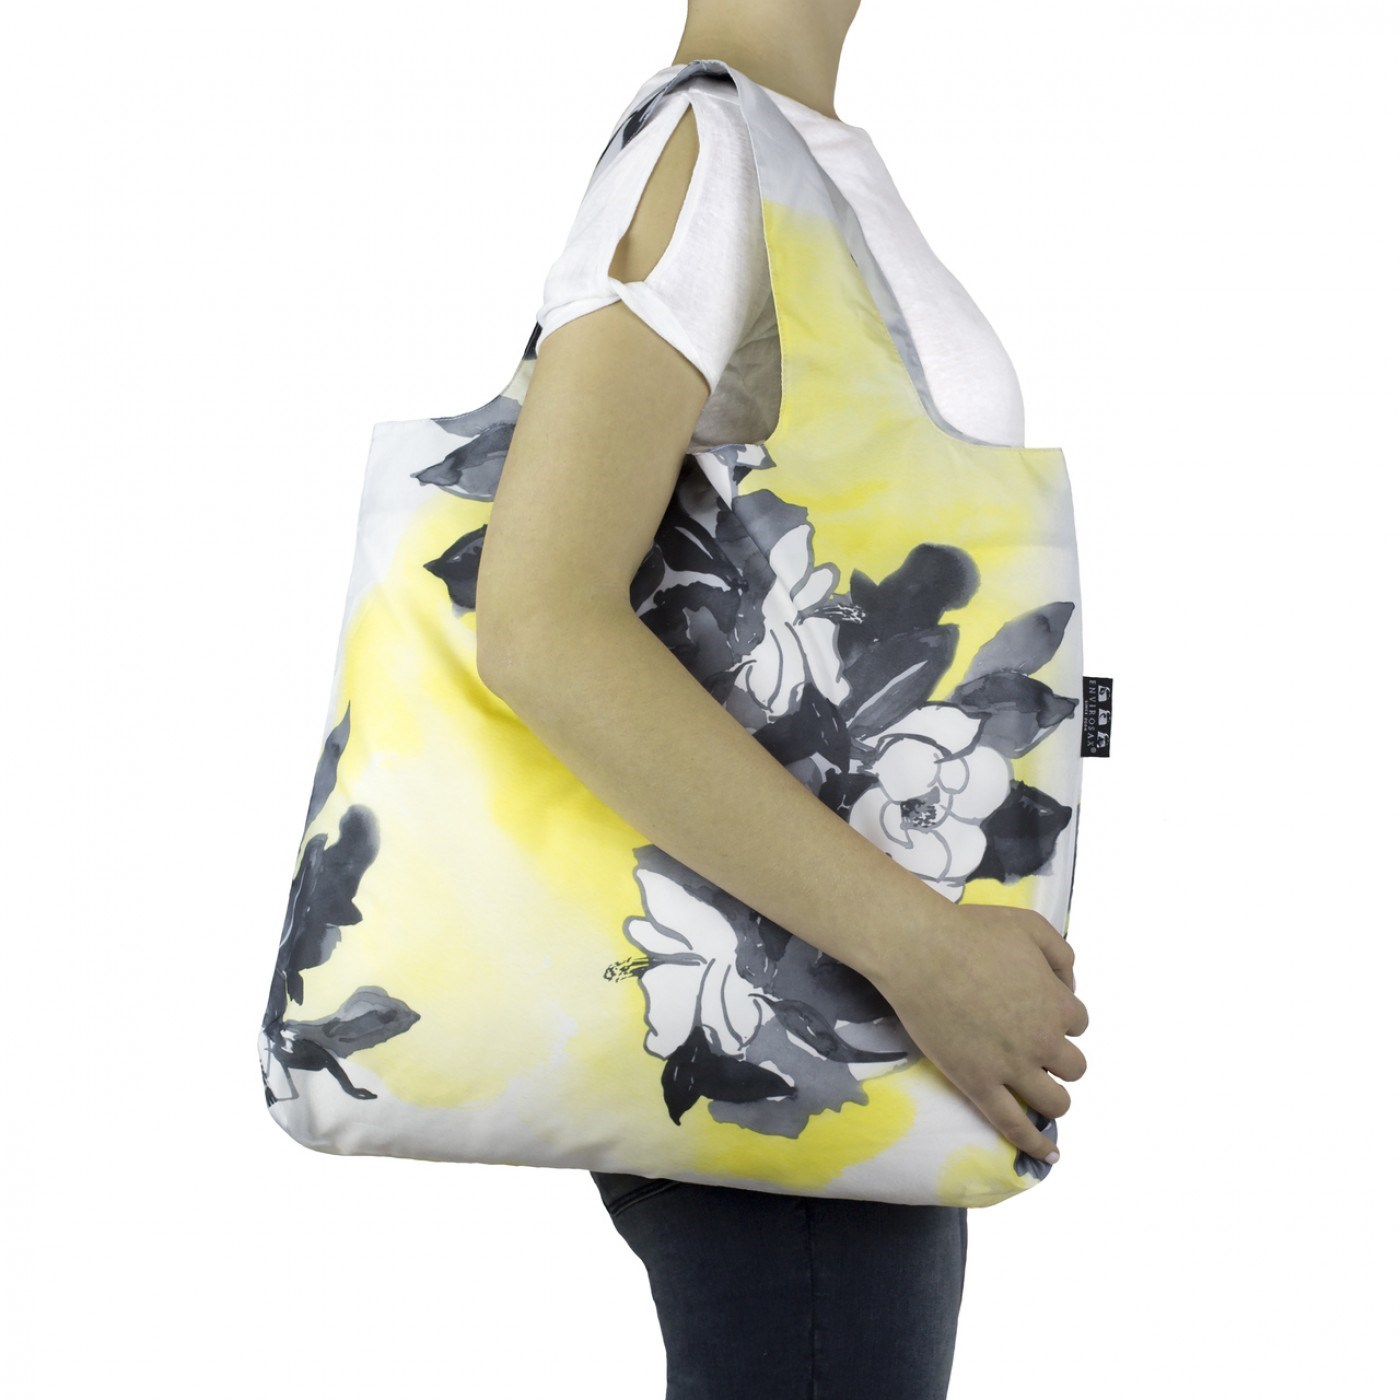 Nákupní taška Envirosax Summer splash_0